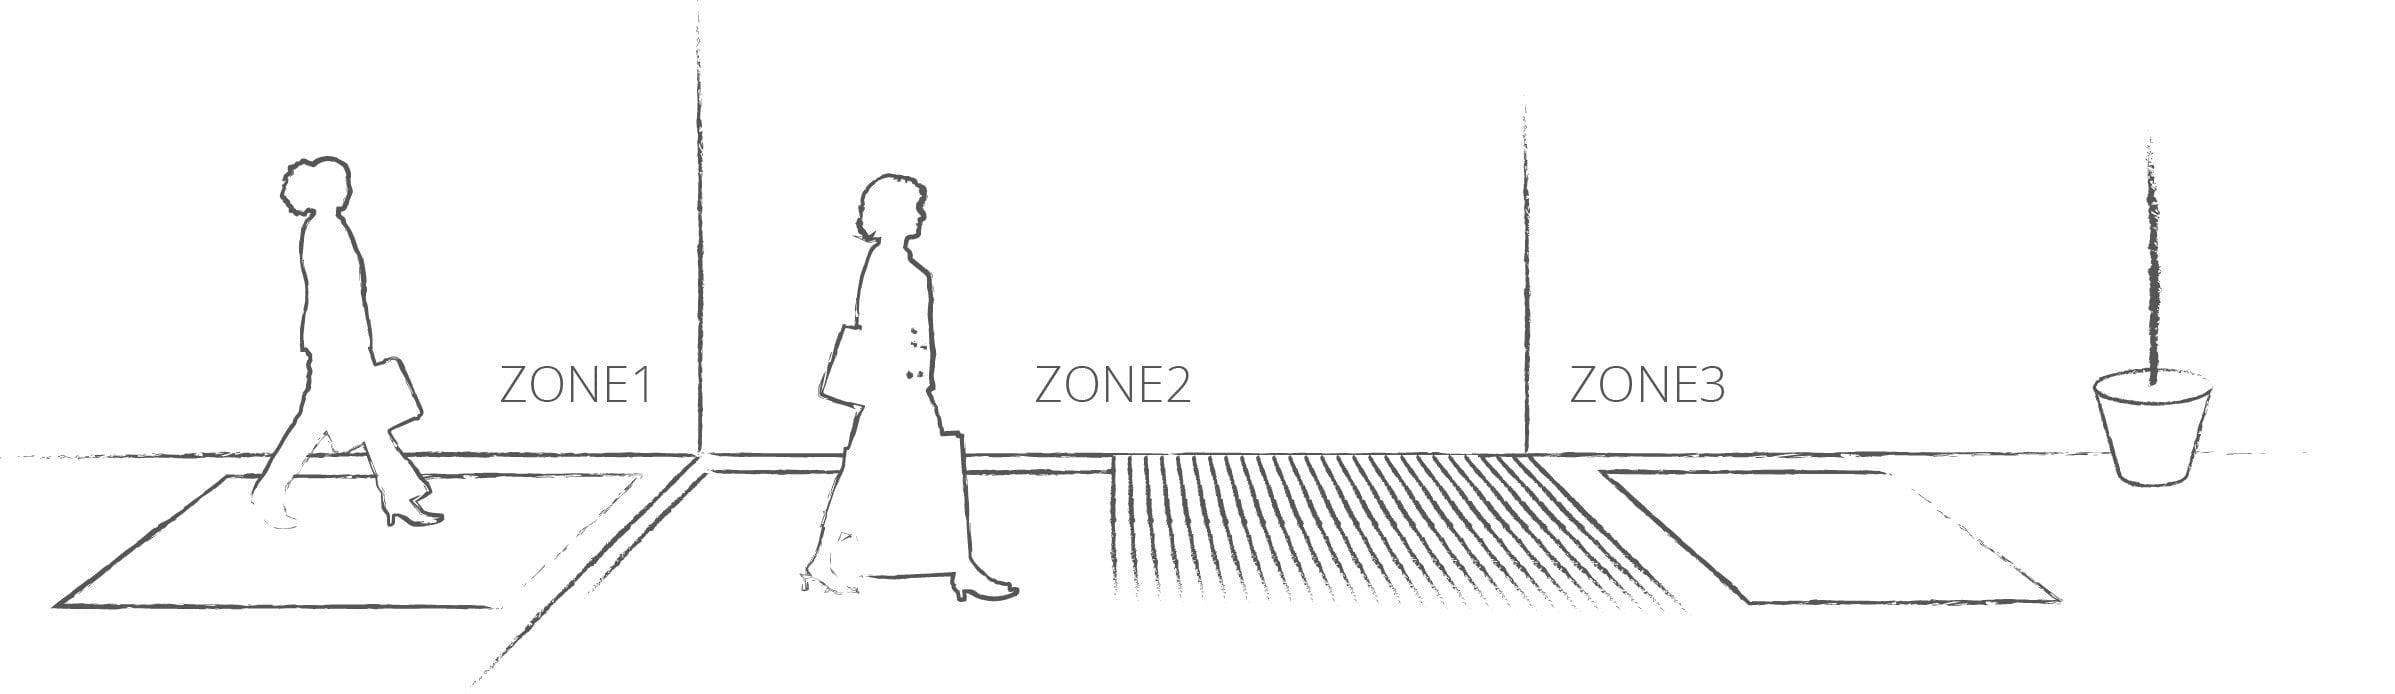 entrance-matting-zones-zoning